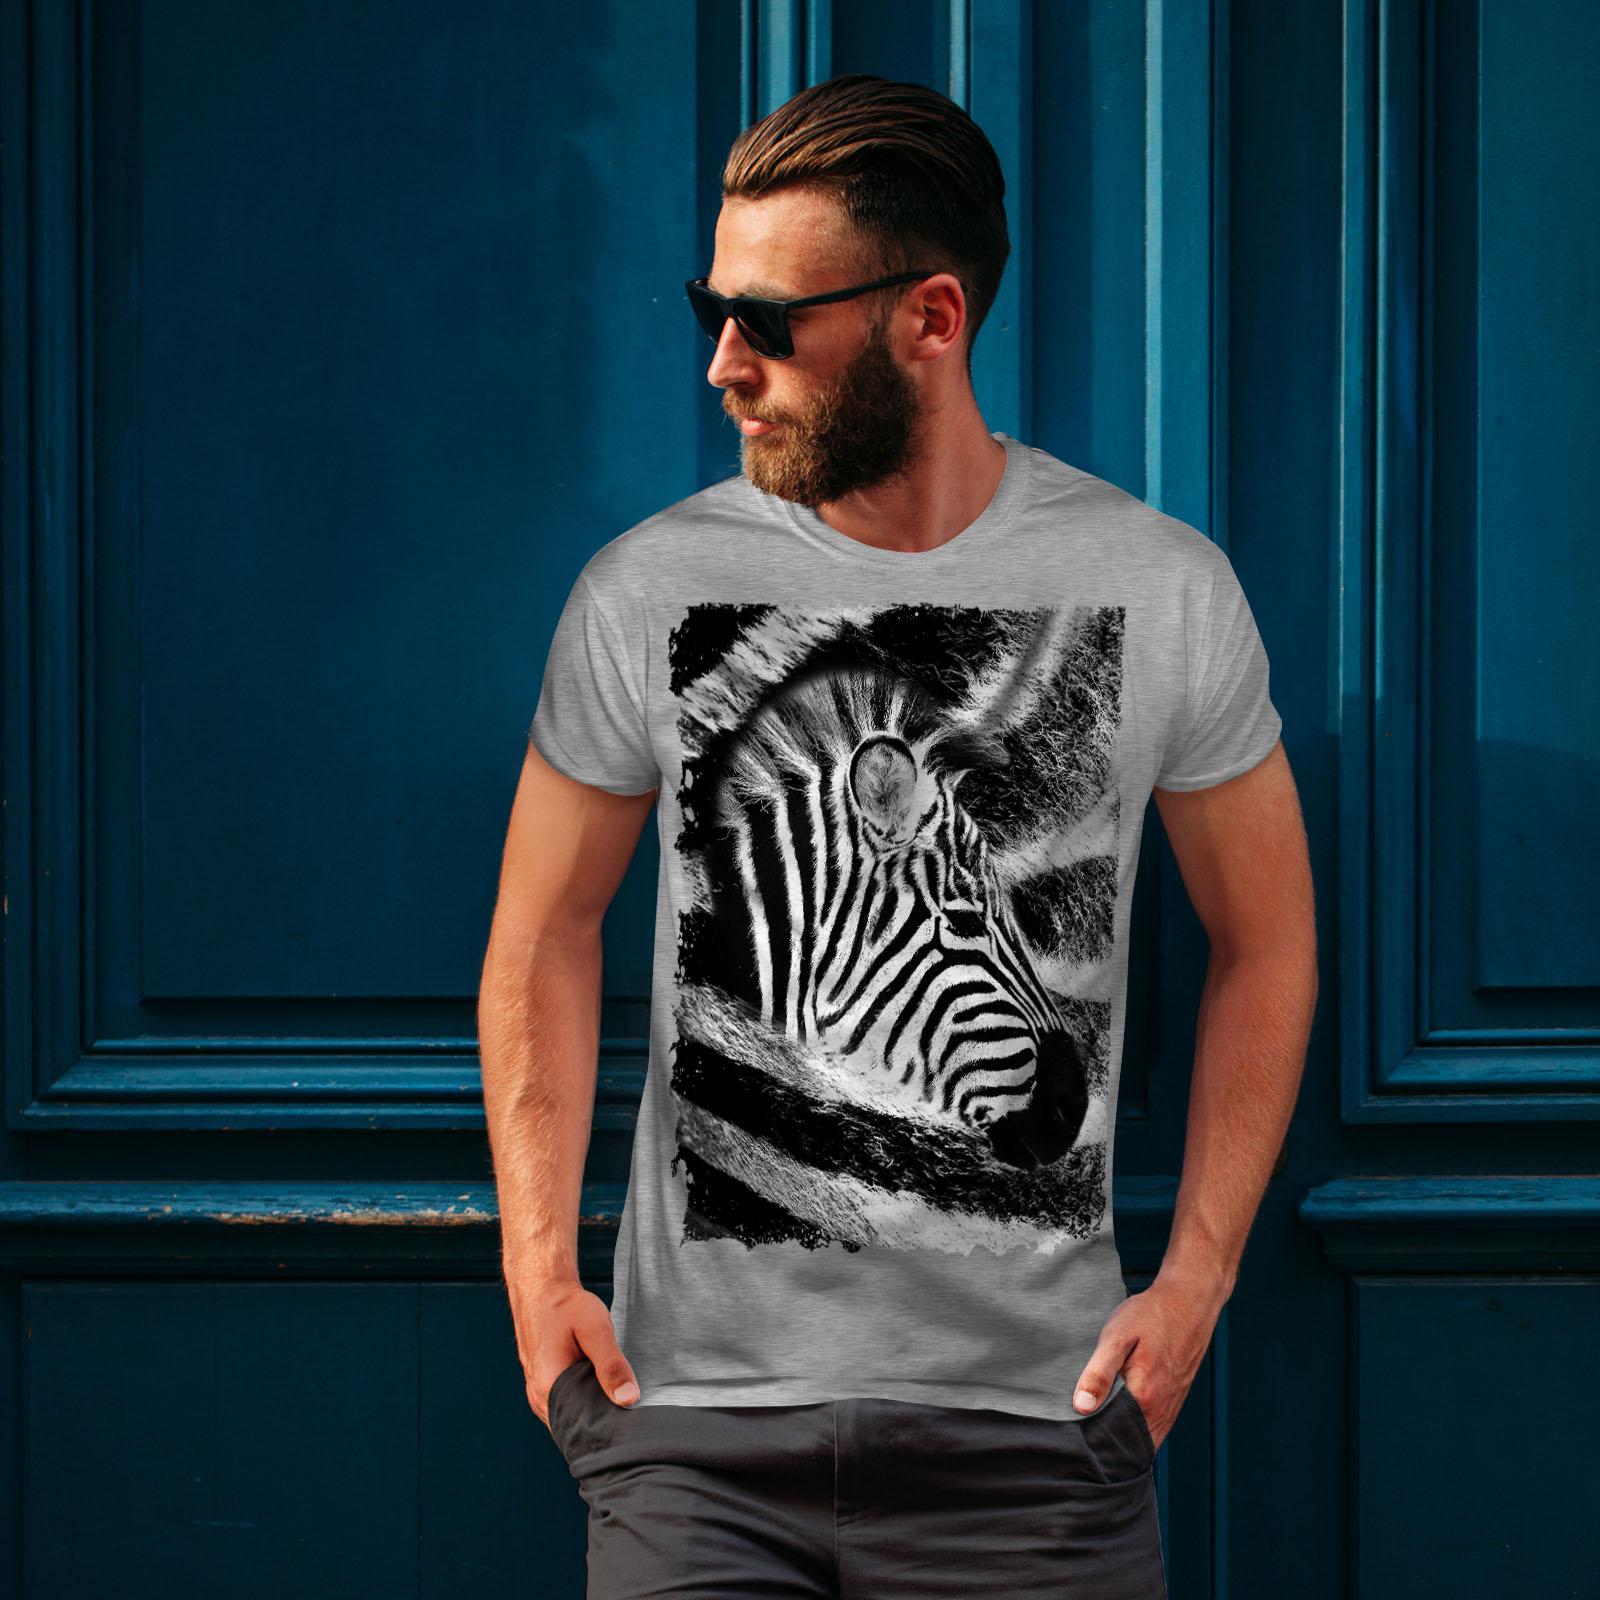 Africa Graphic Design Printed Tee Wellcoda Animal Design Cute Mens T-shirt